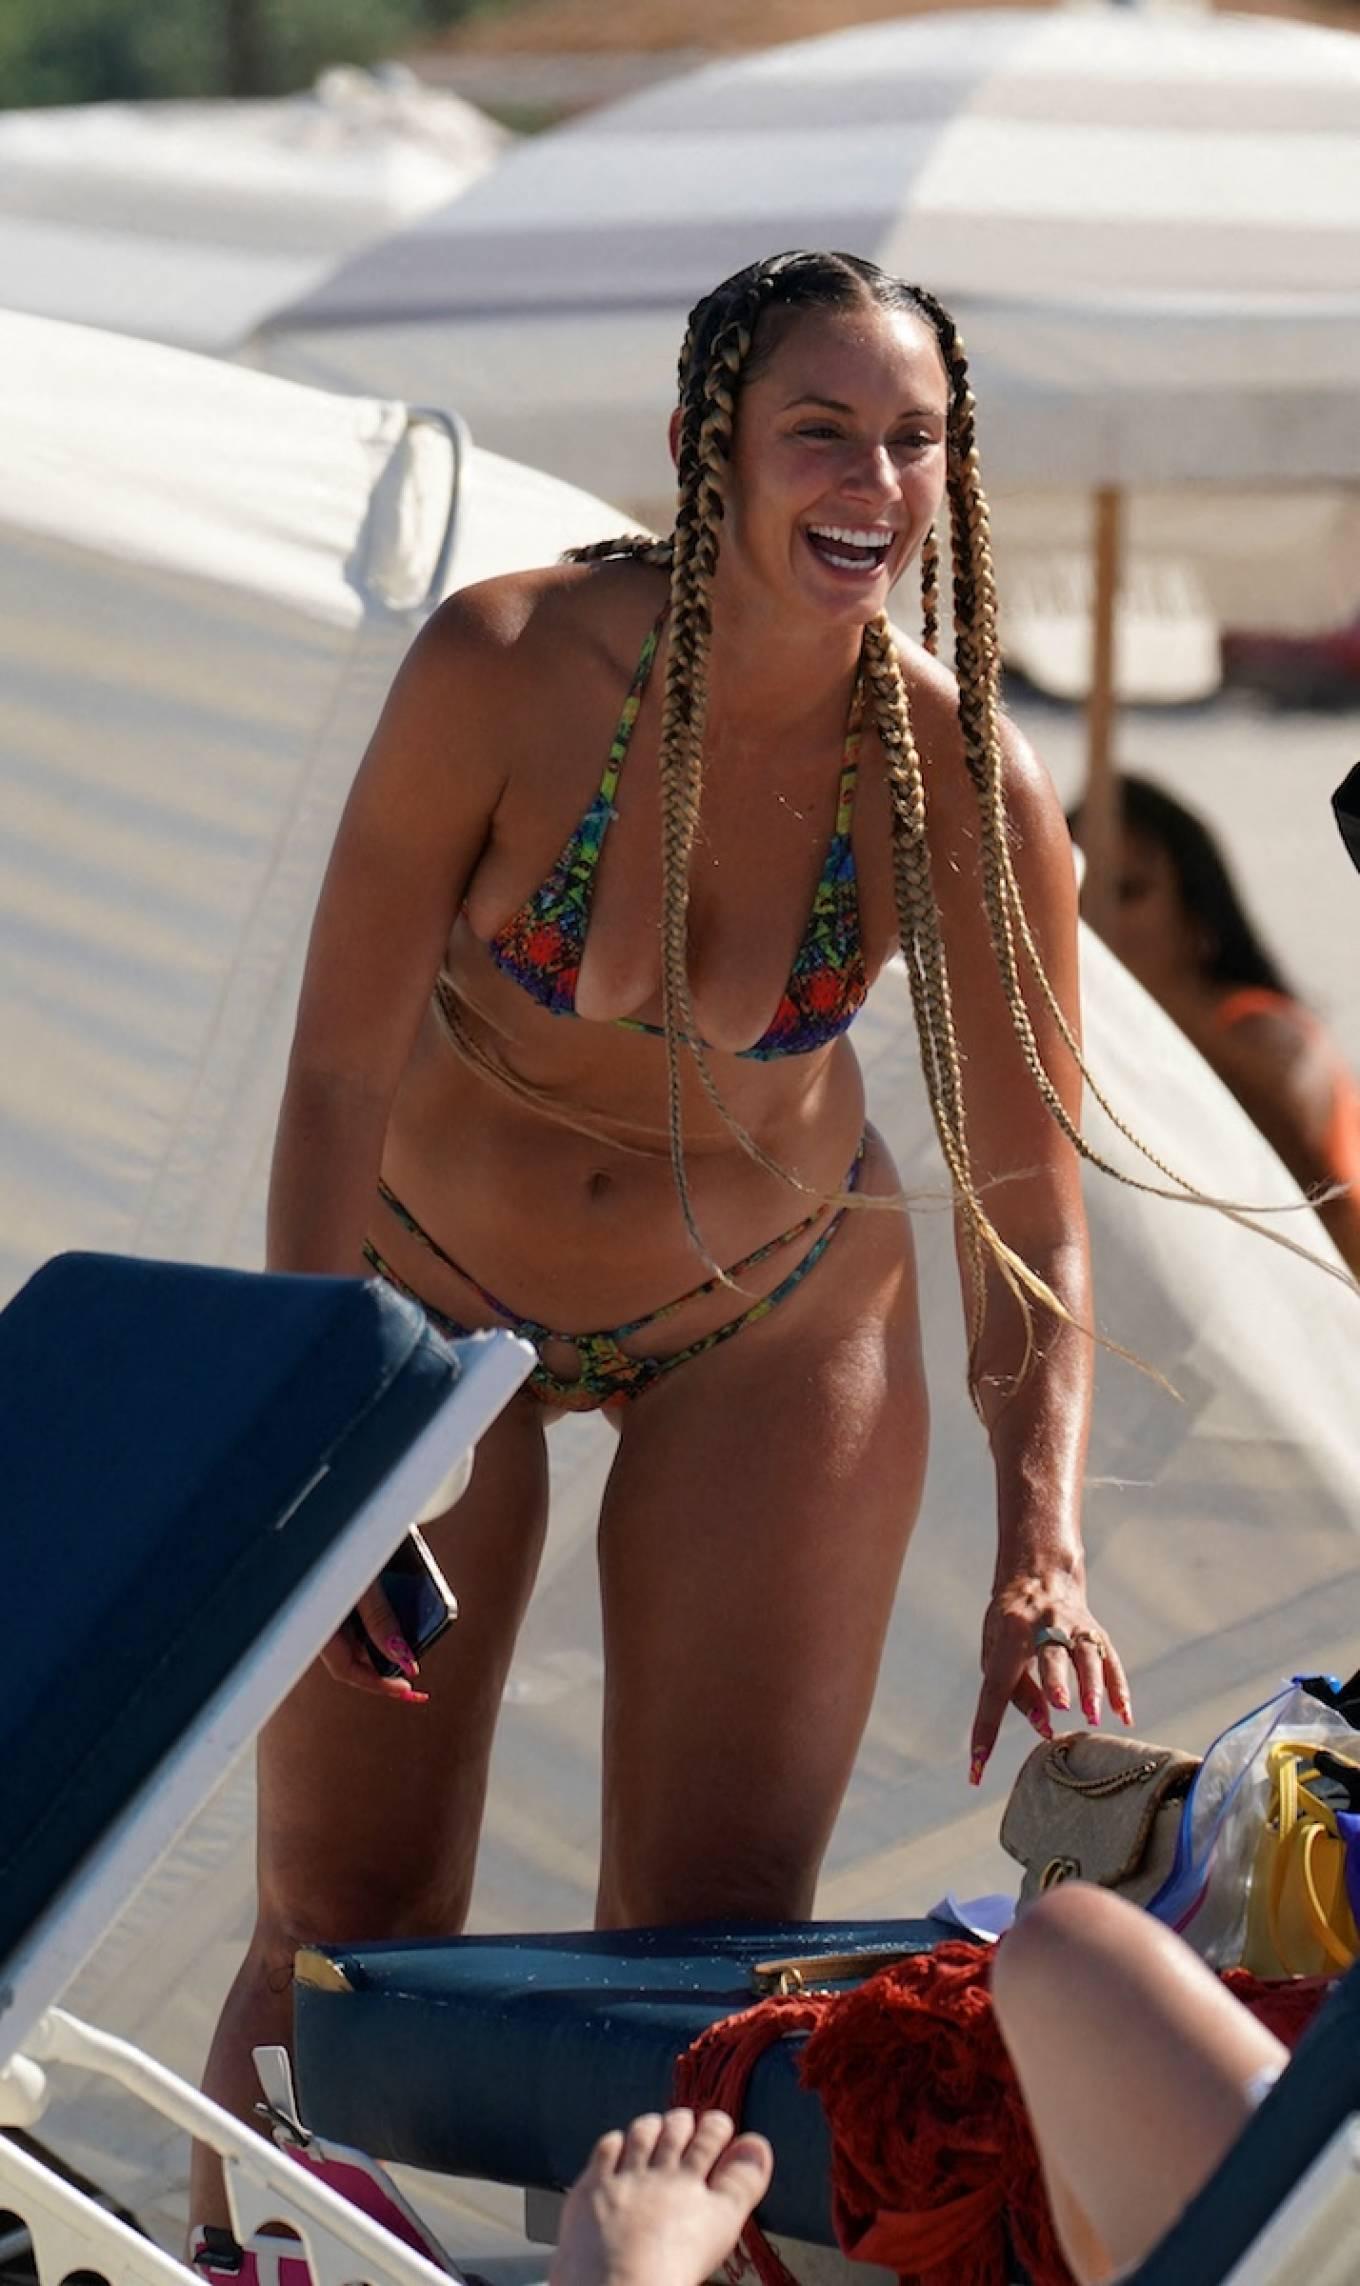 YesJulz 2021 : YesJulz – In a bikini at the beach -11